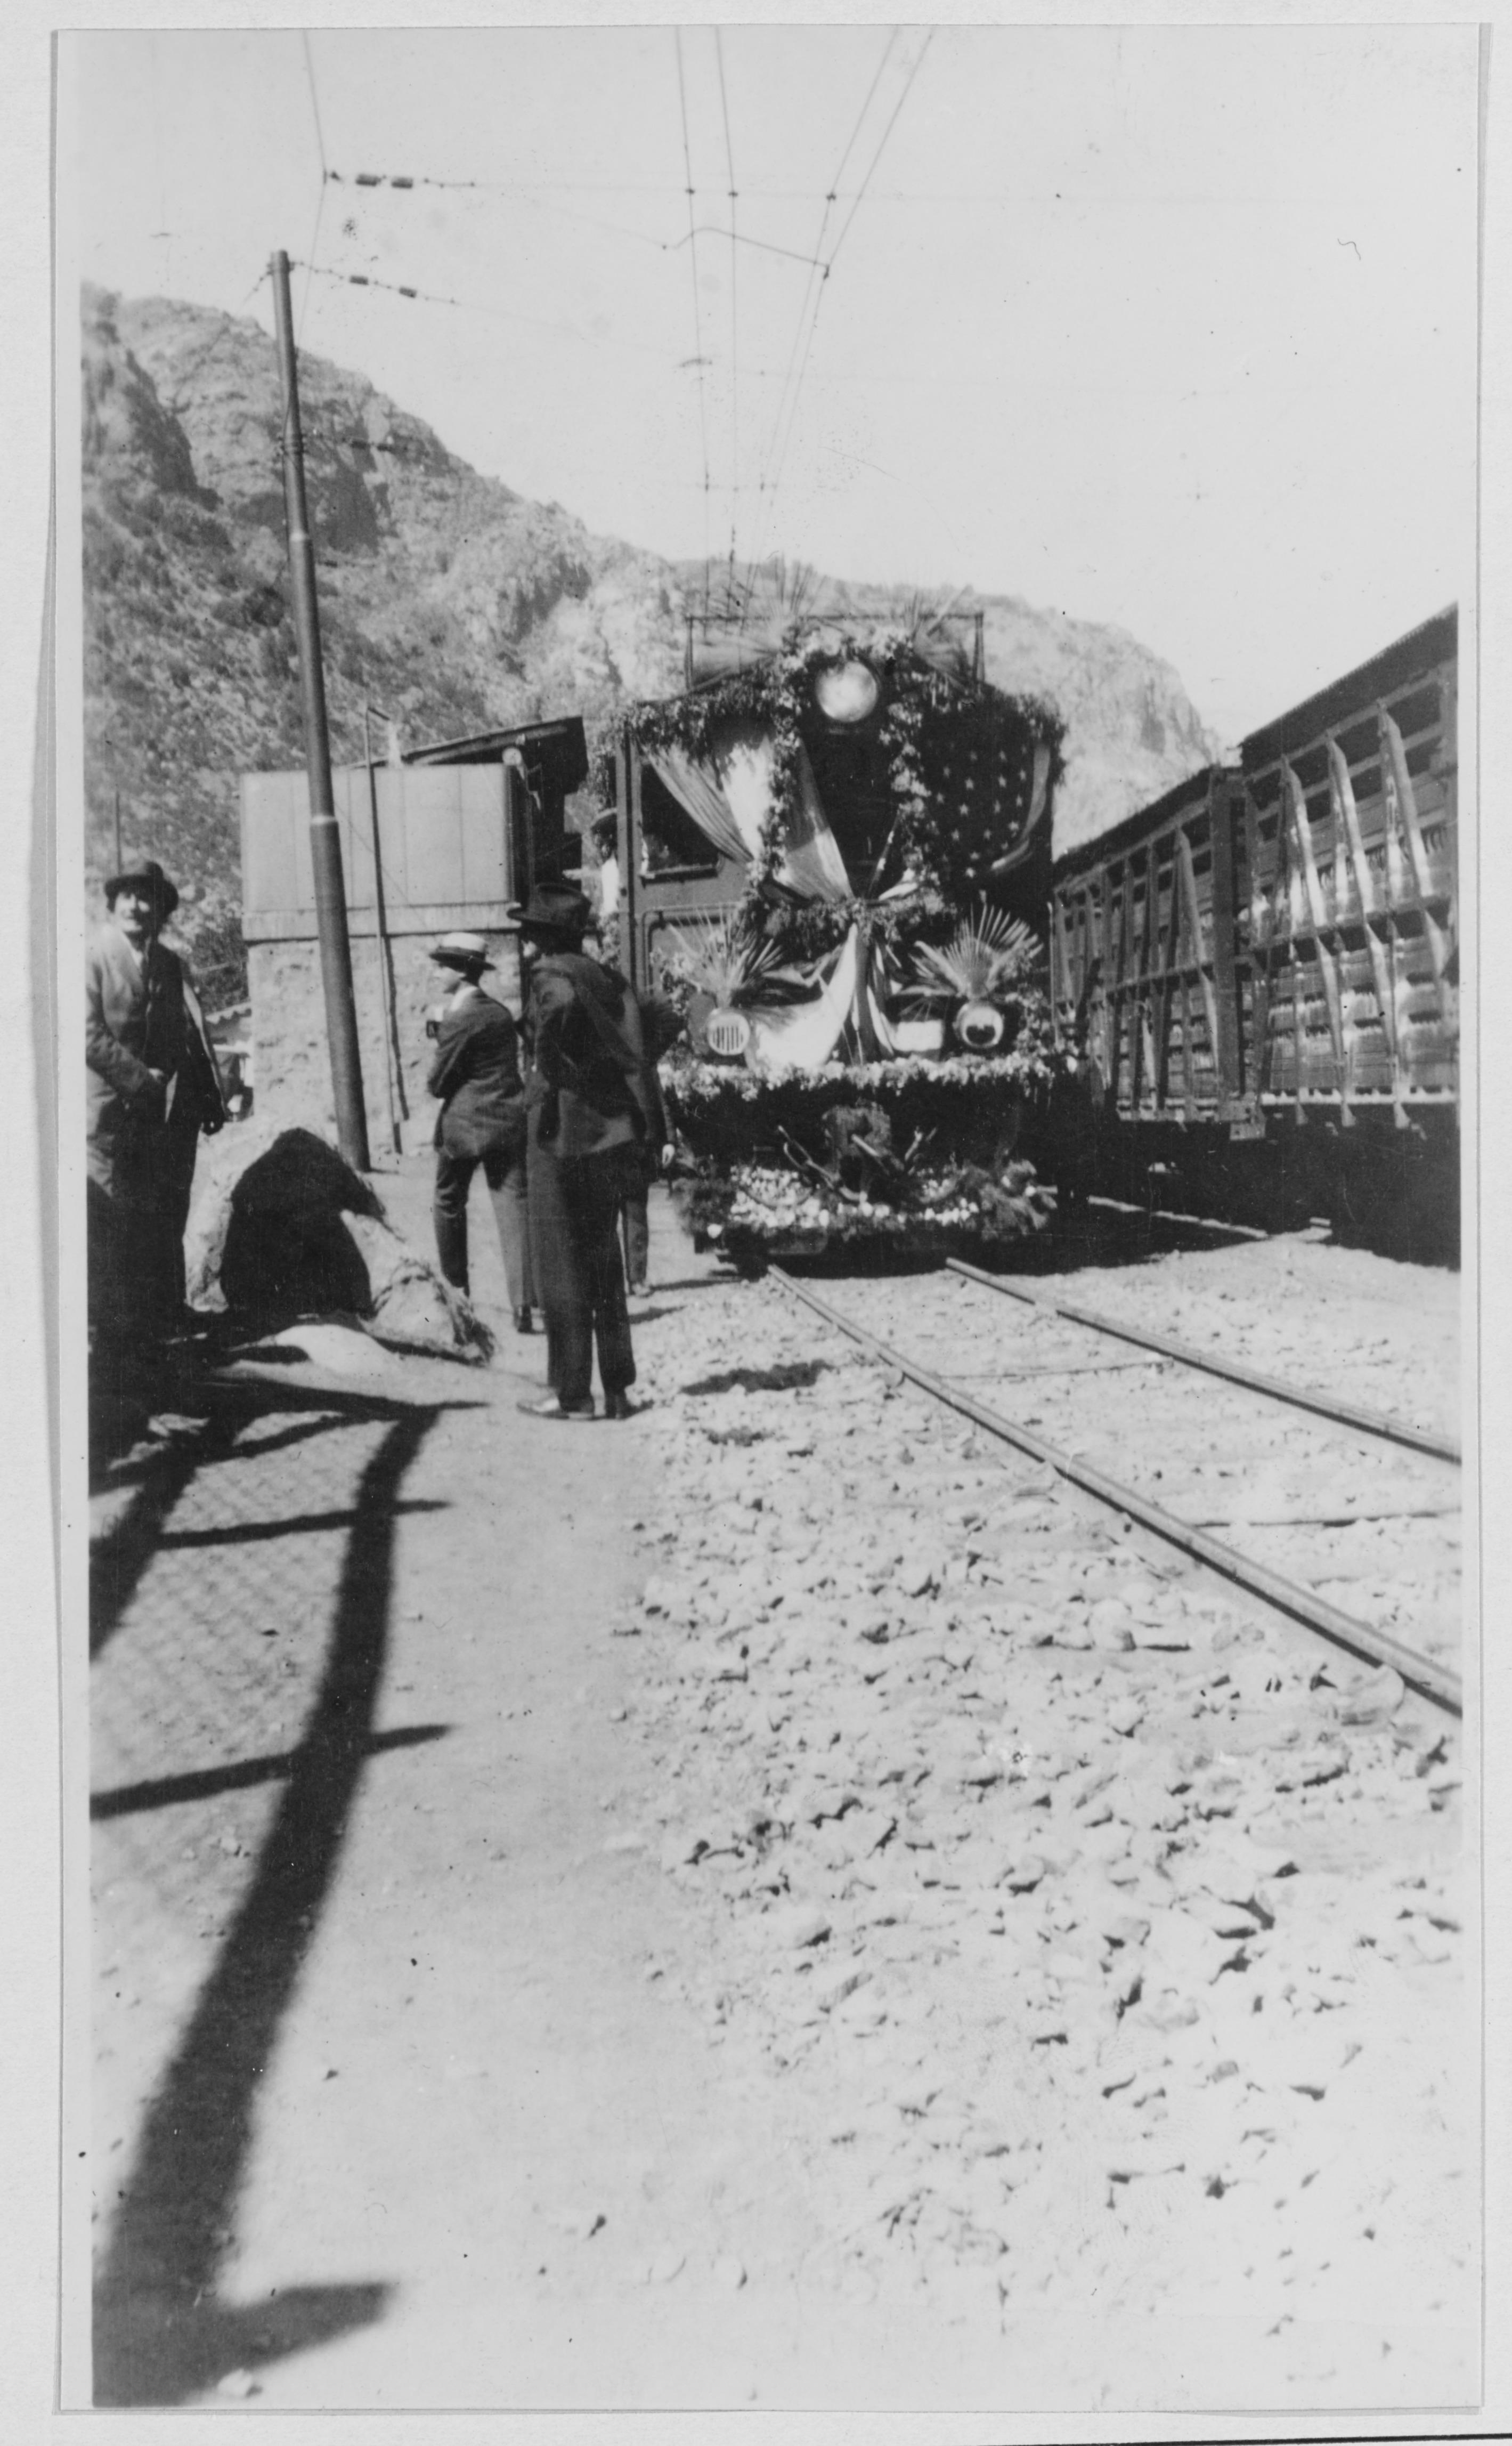 Enterreno - Fotos históricas de chile - fotos antiguas de Chile - Tren Santiago, 1928